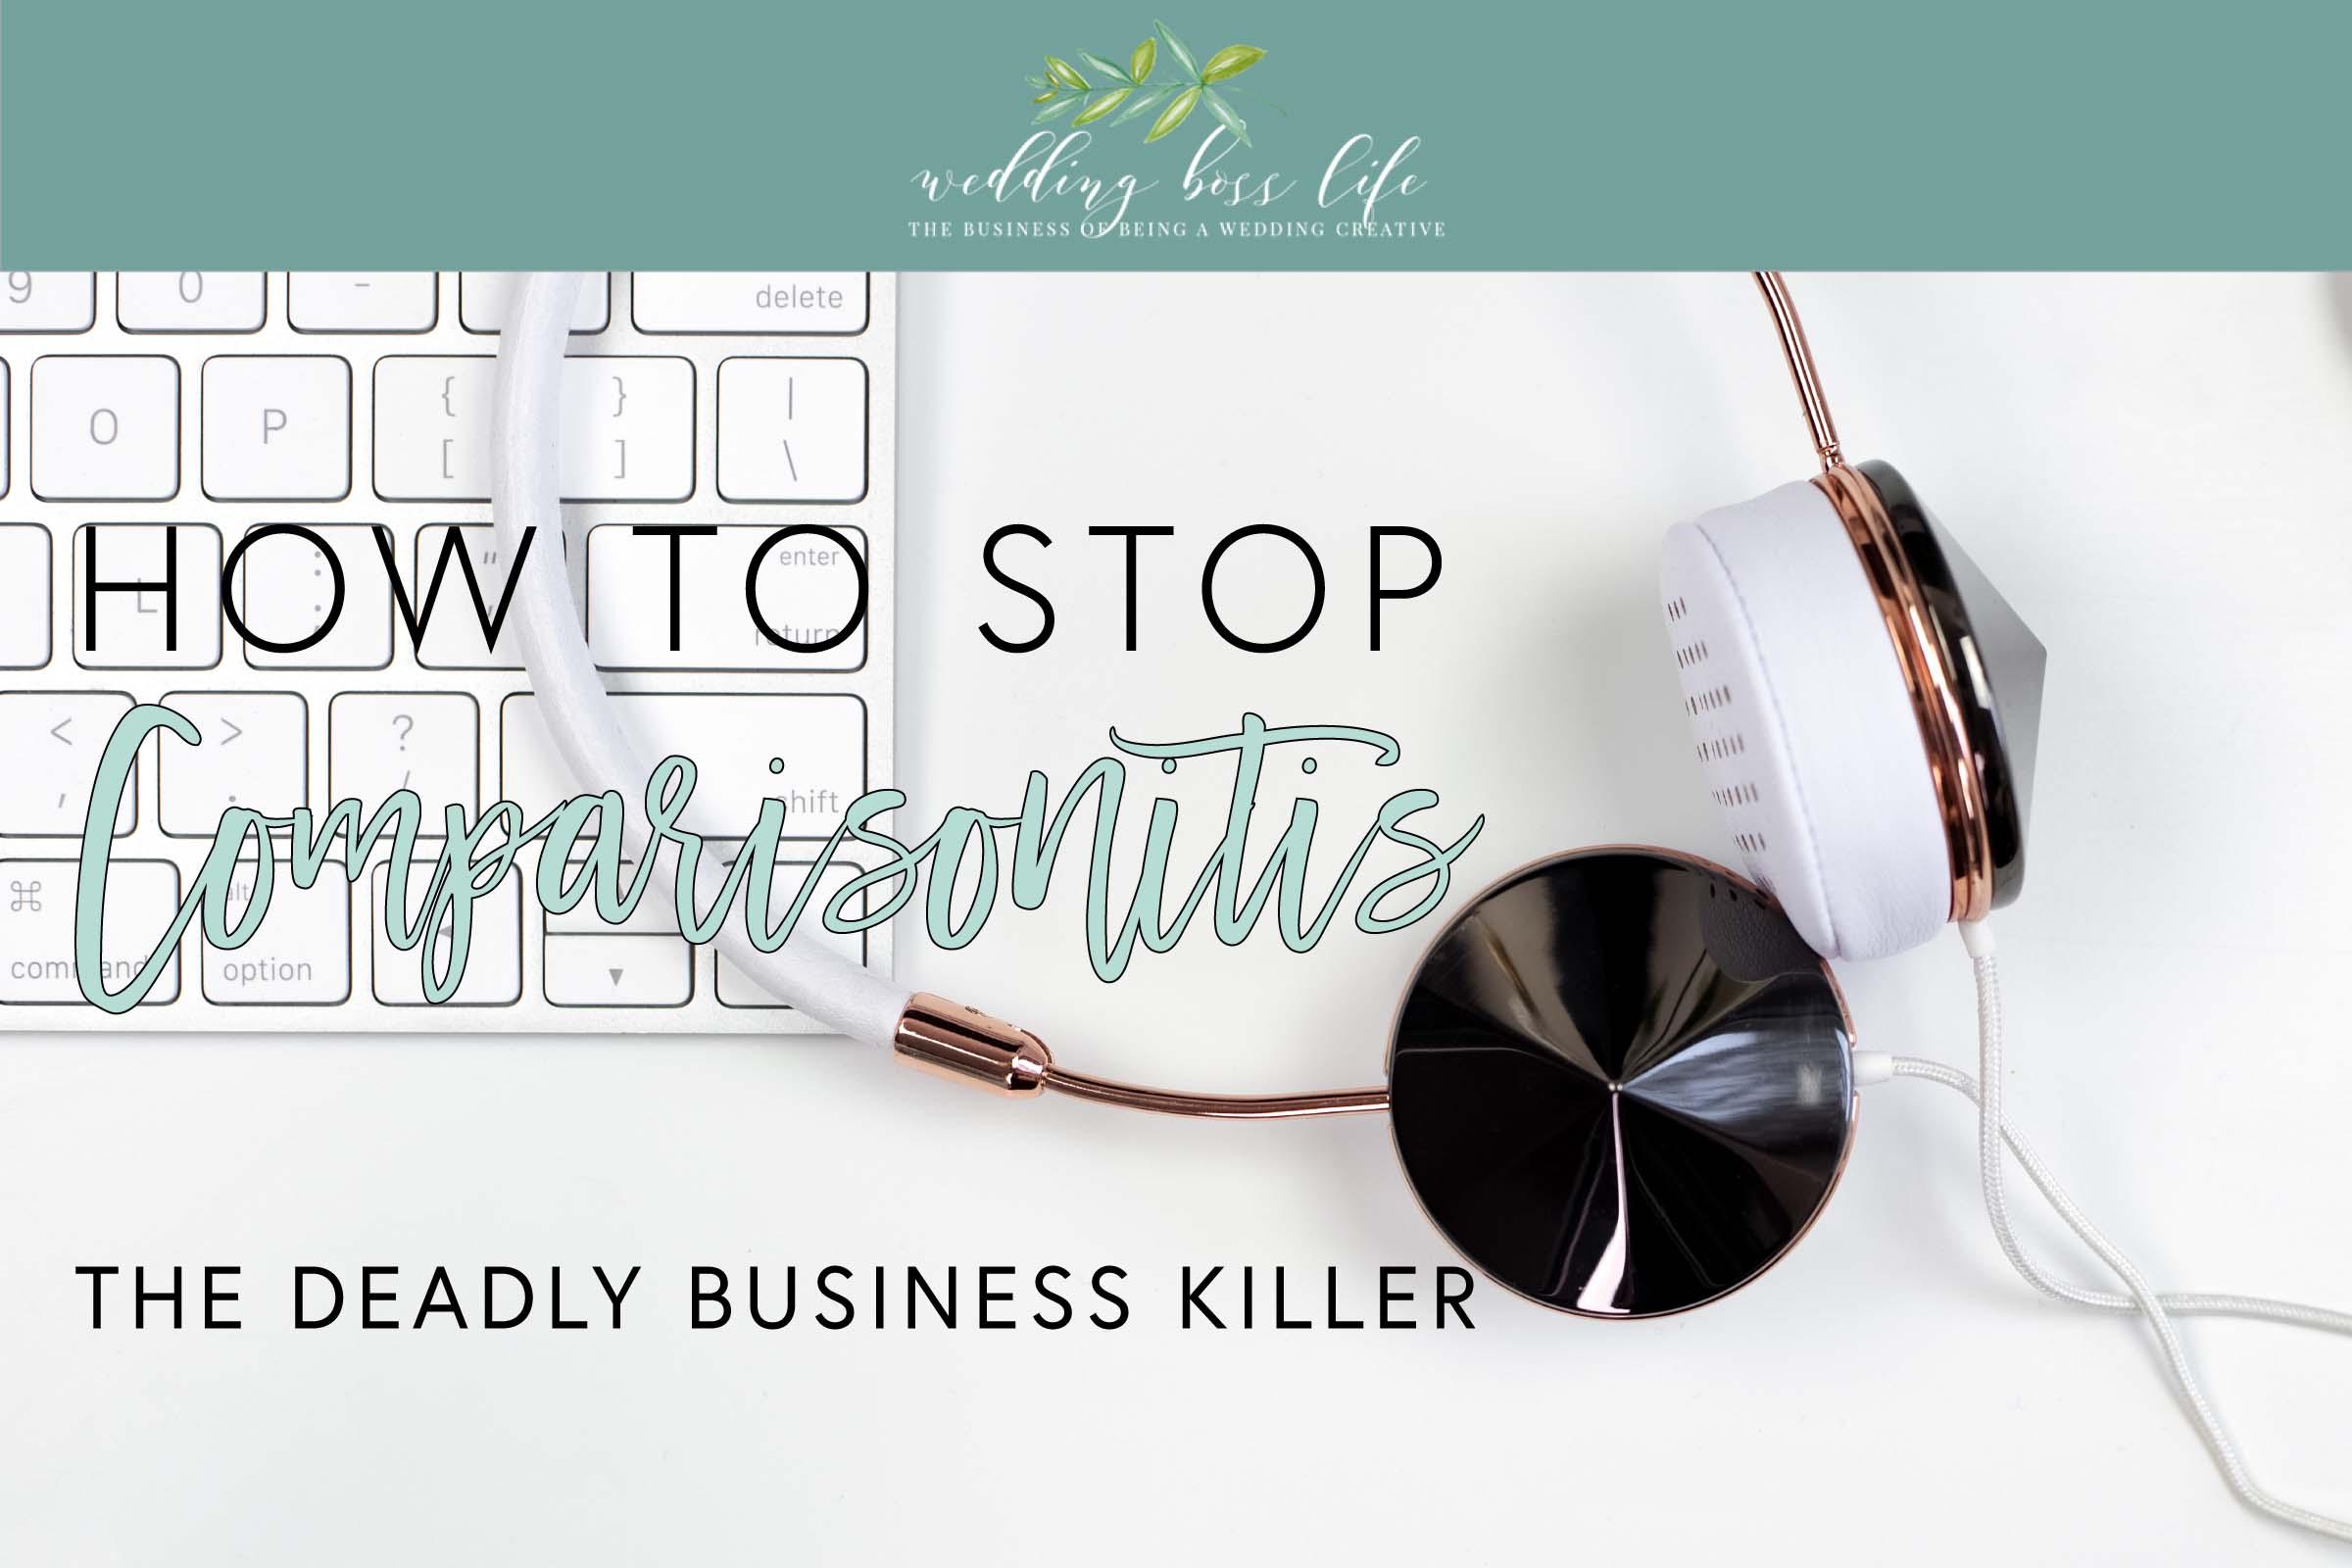 Comparisonitis - The Deadly Business Killer